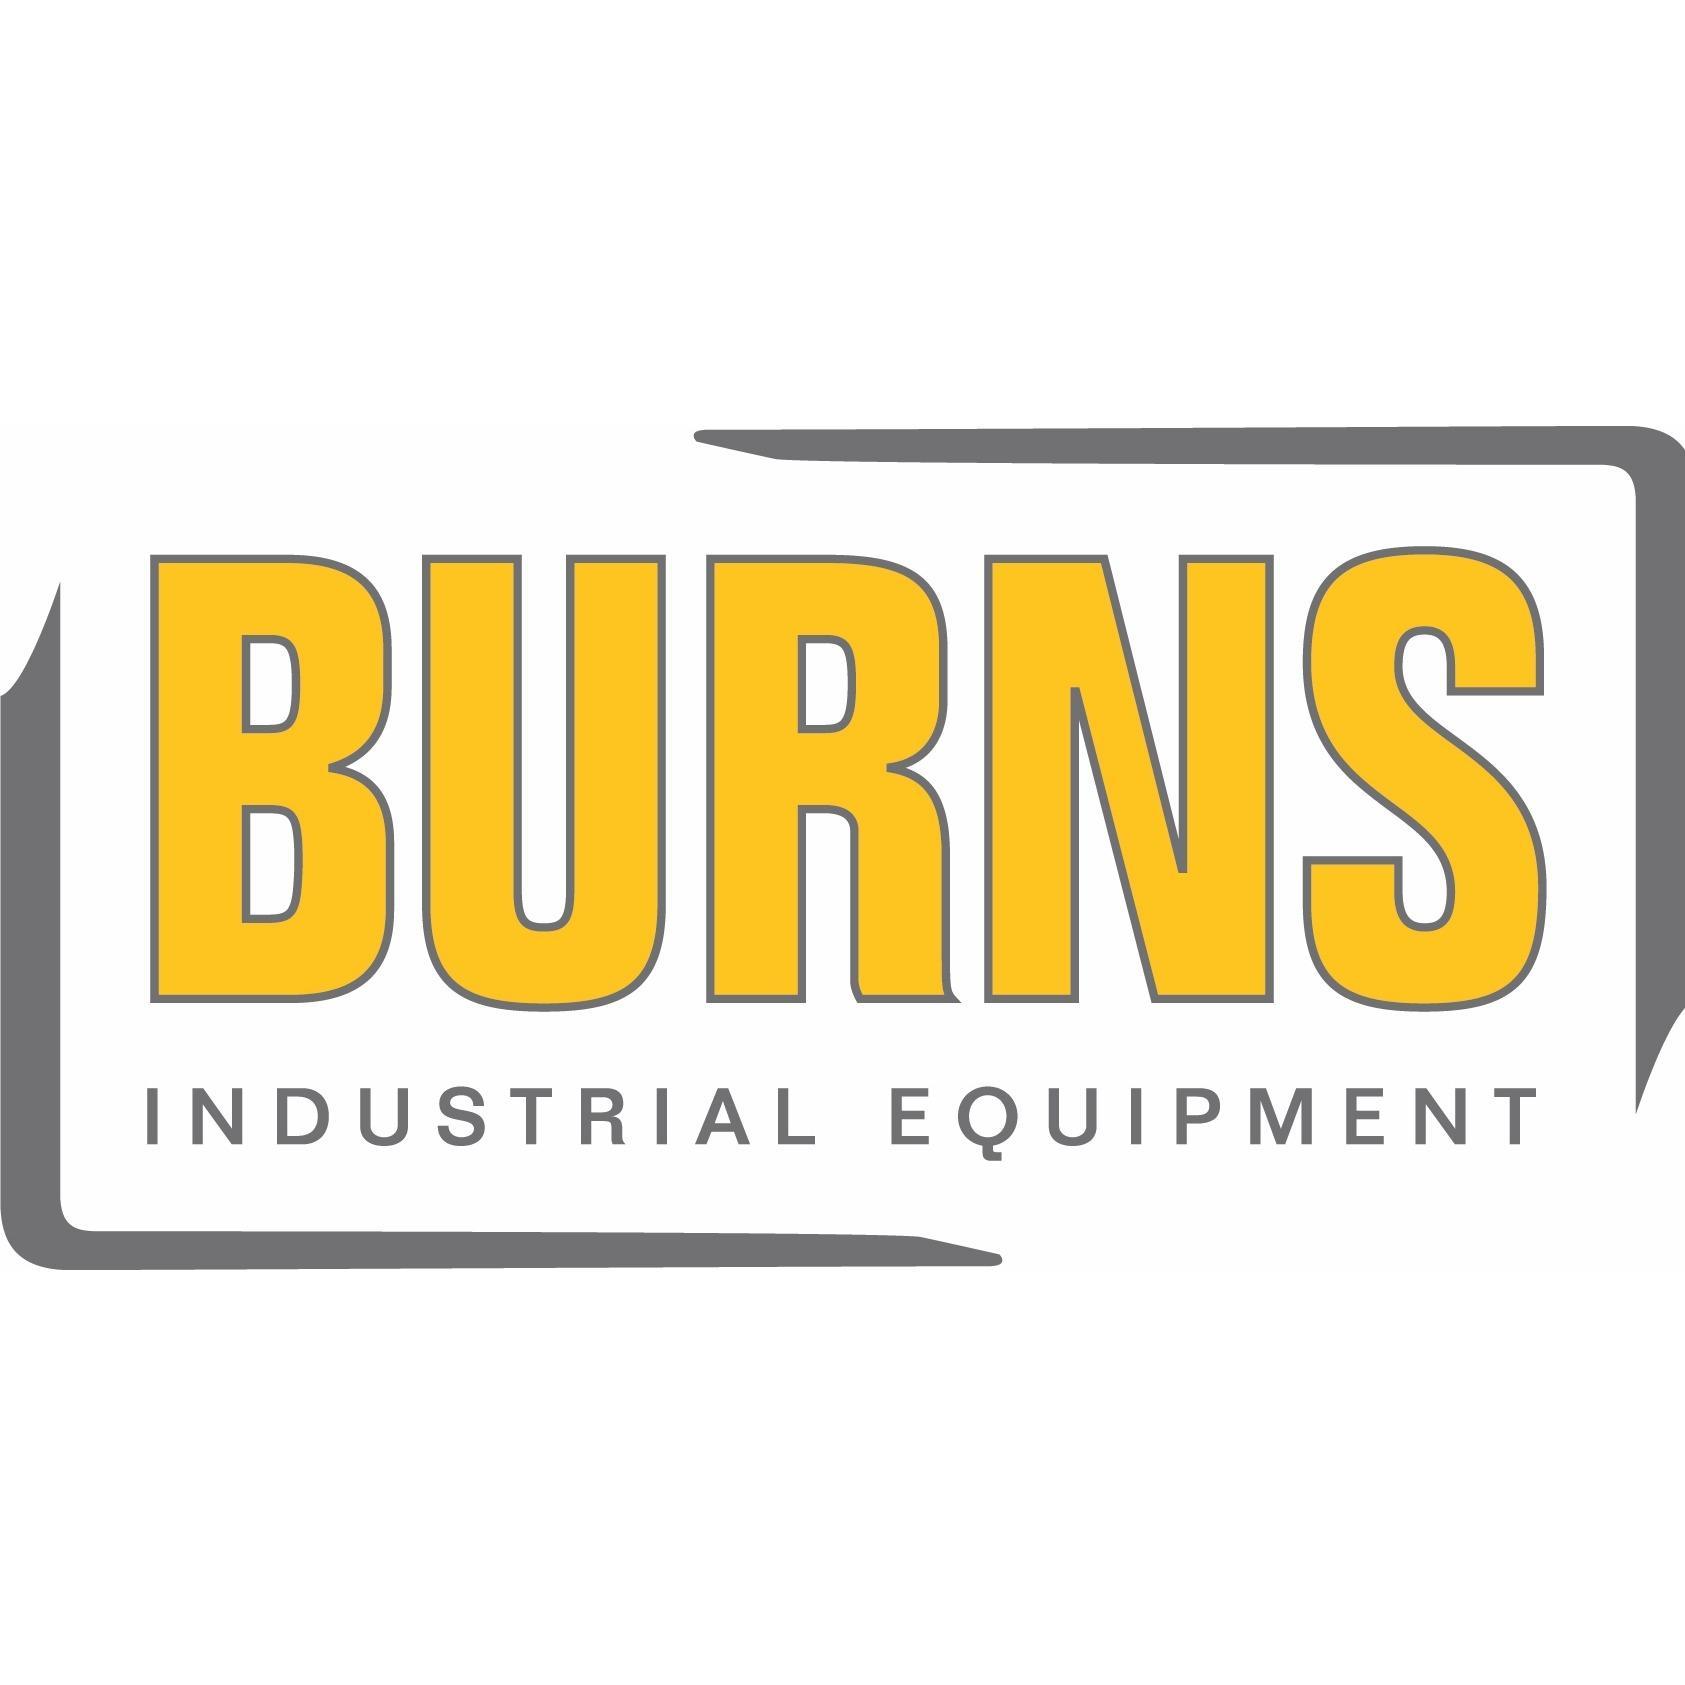 Burns Industrial Equipment - Macedonia, OH 44056 - (330)468-4900 | ShowMeLocal.com